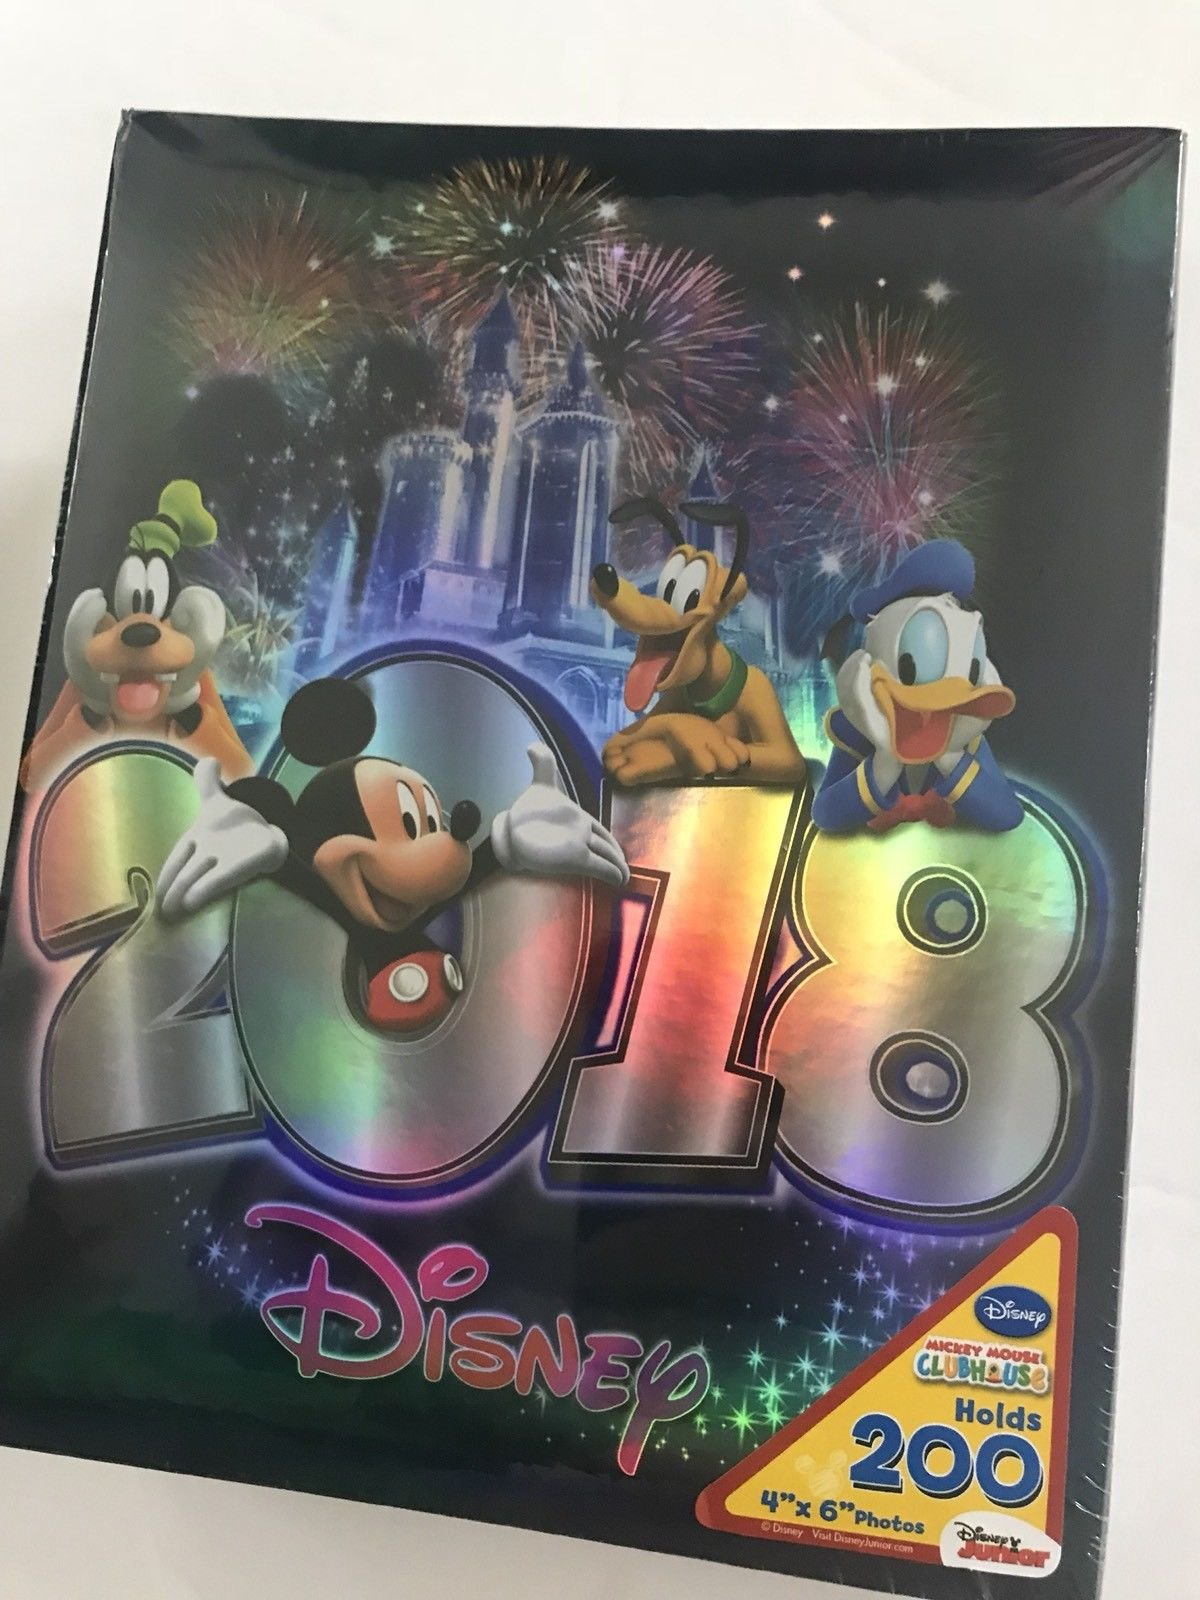 Disney Mickey Mouse 2018 Castle 200 Picture Photo Album 4x6